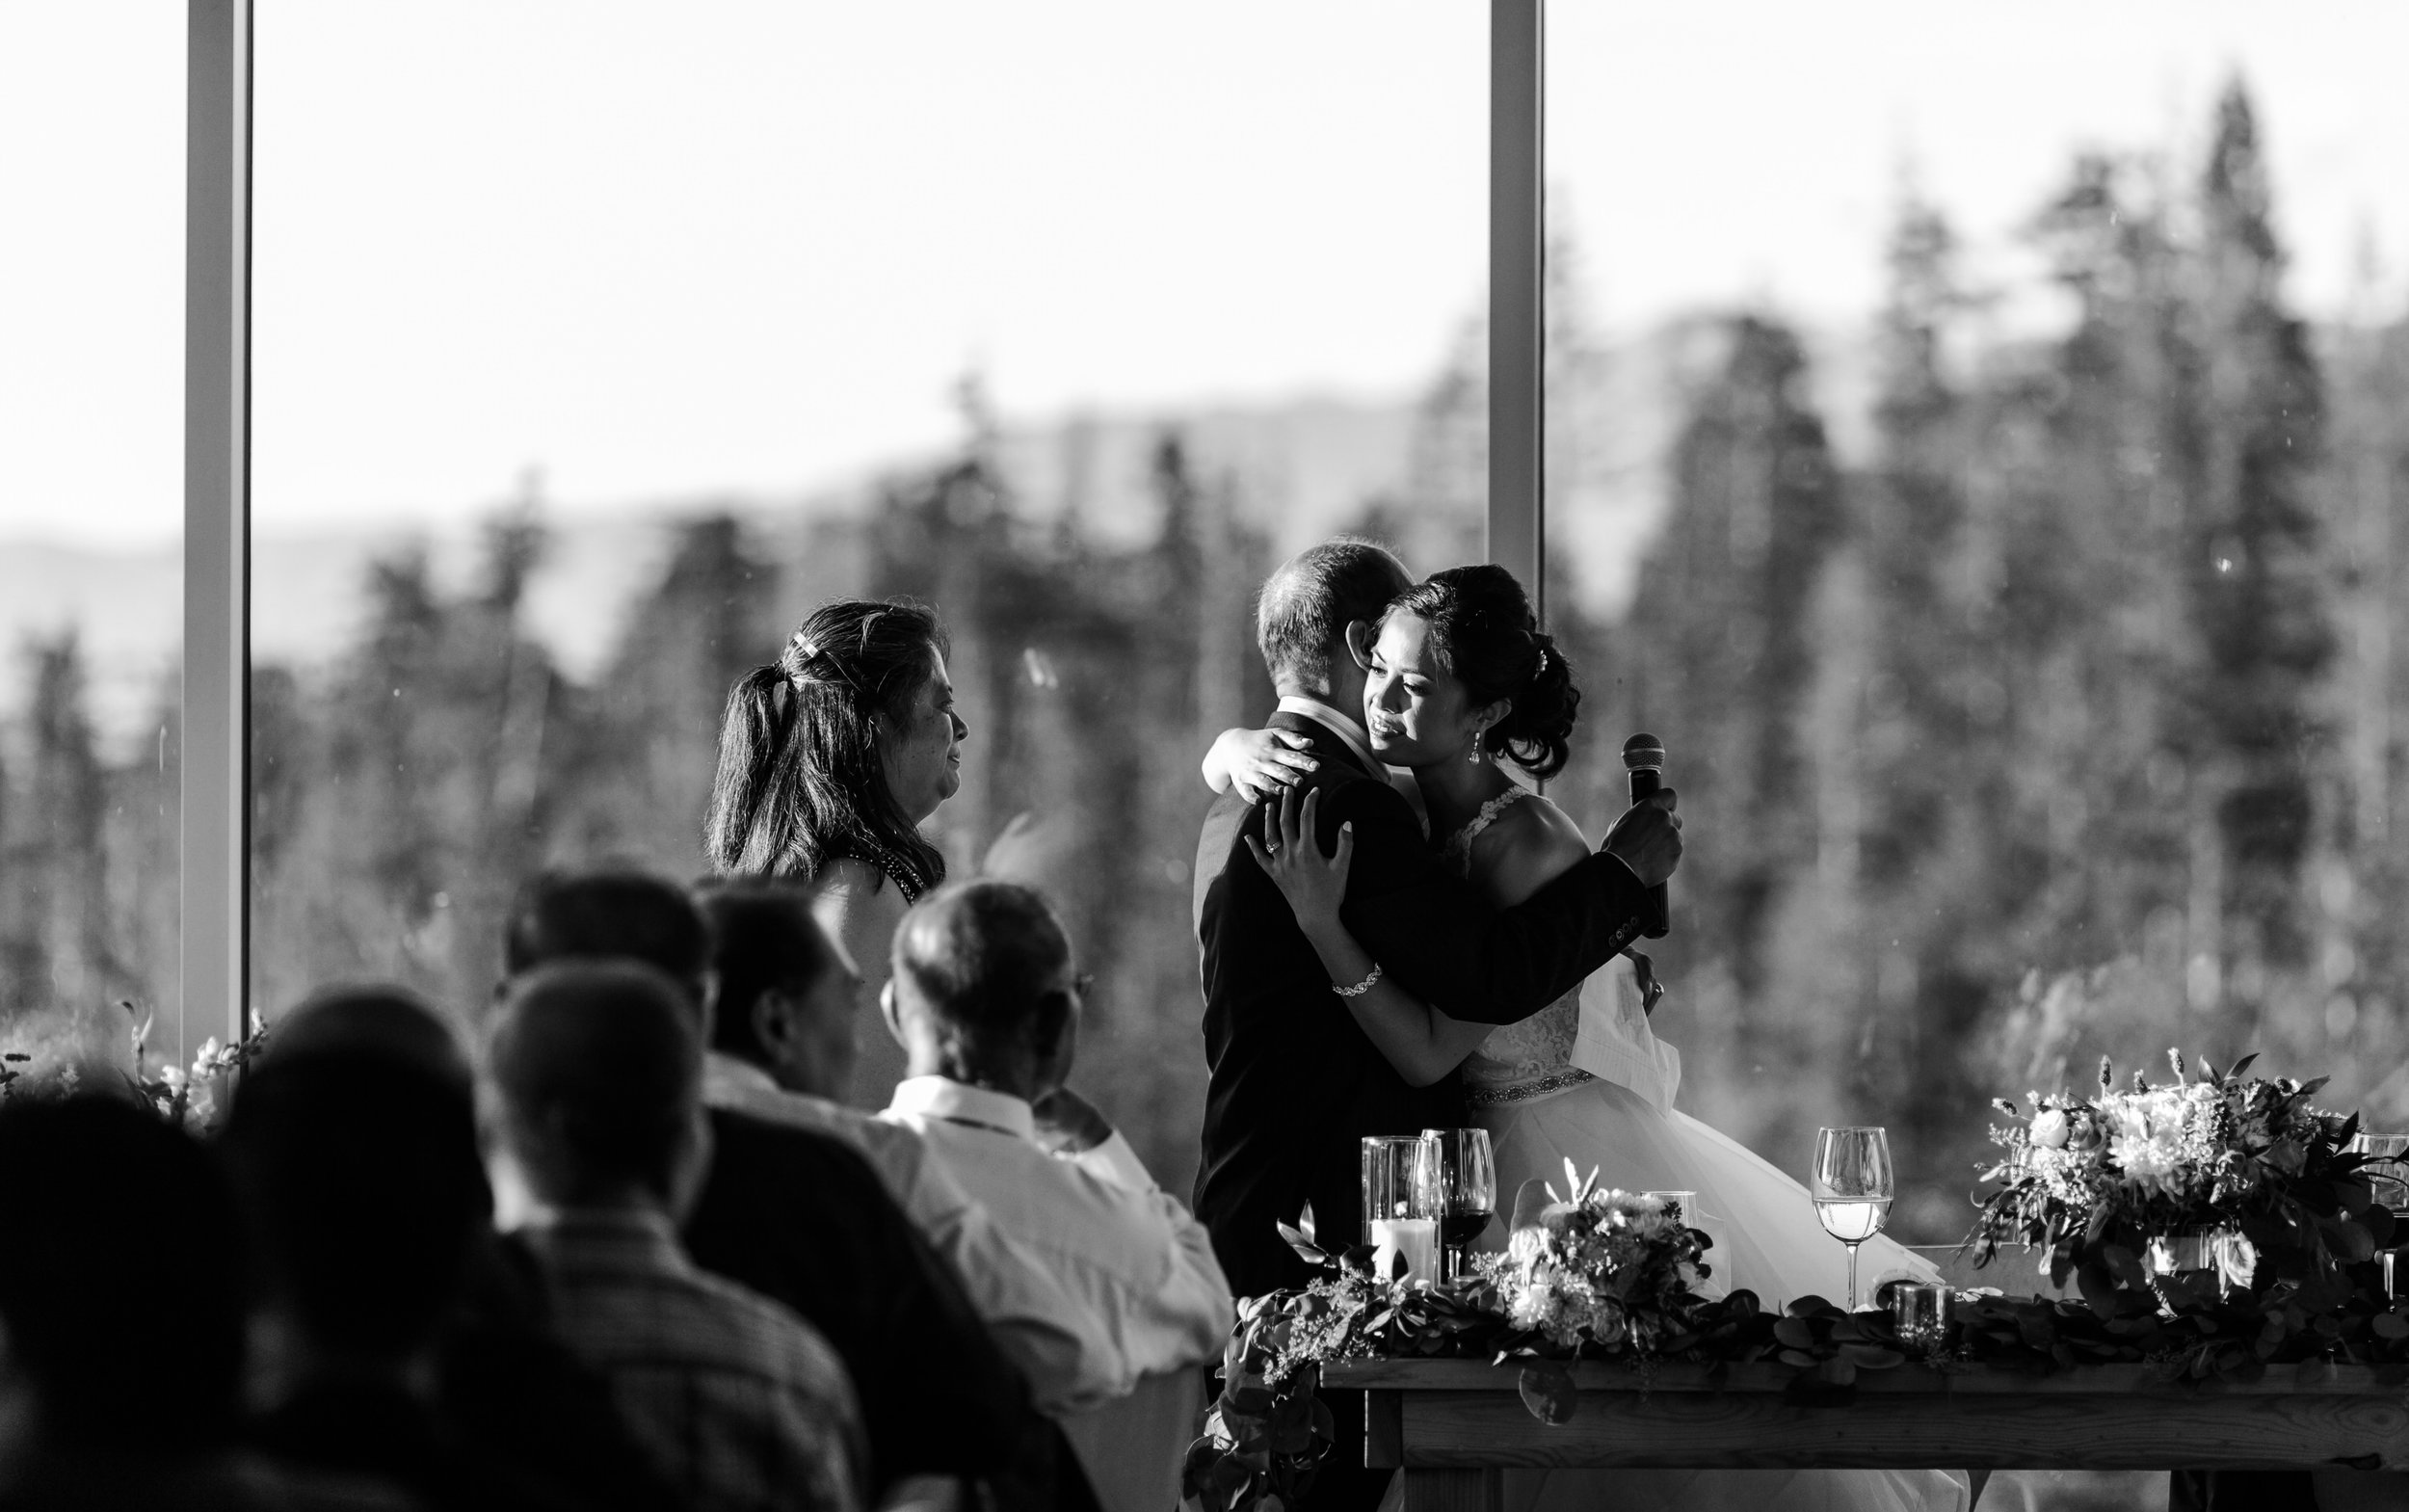 Squamish Wedding Photographer - Sea to Sky Gondola Wedding Photos -  Vancouver Wedding Photographer & Videographer - Sunshine Coast Wedding Photos - Sunshine Coast Wedding Photographer - Jennifer Picard Photography - IMG_4820.jpg